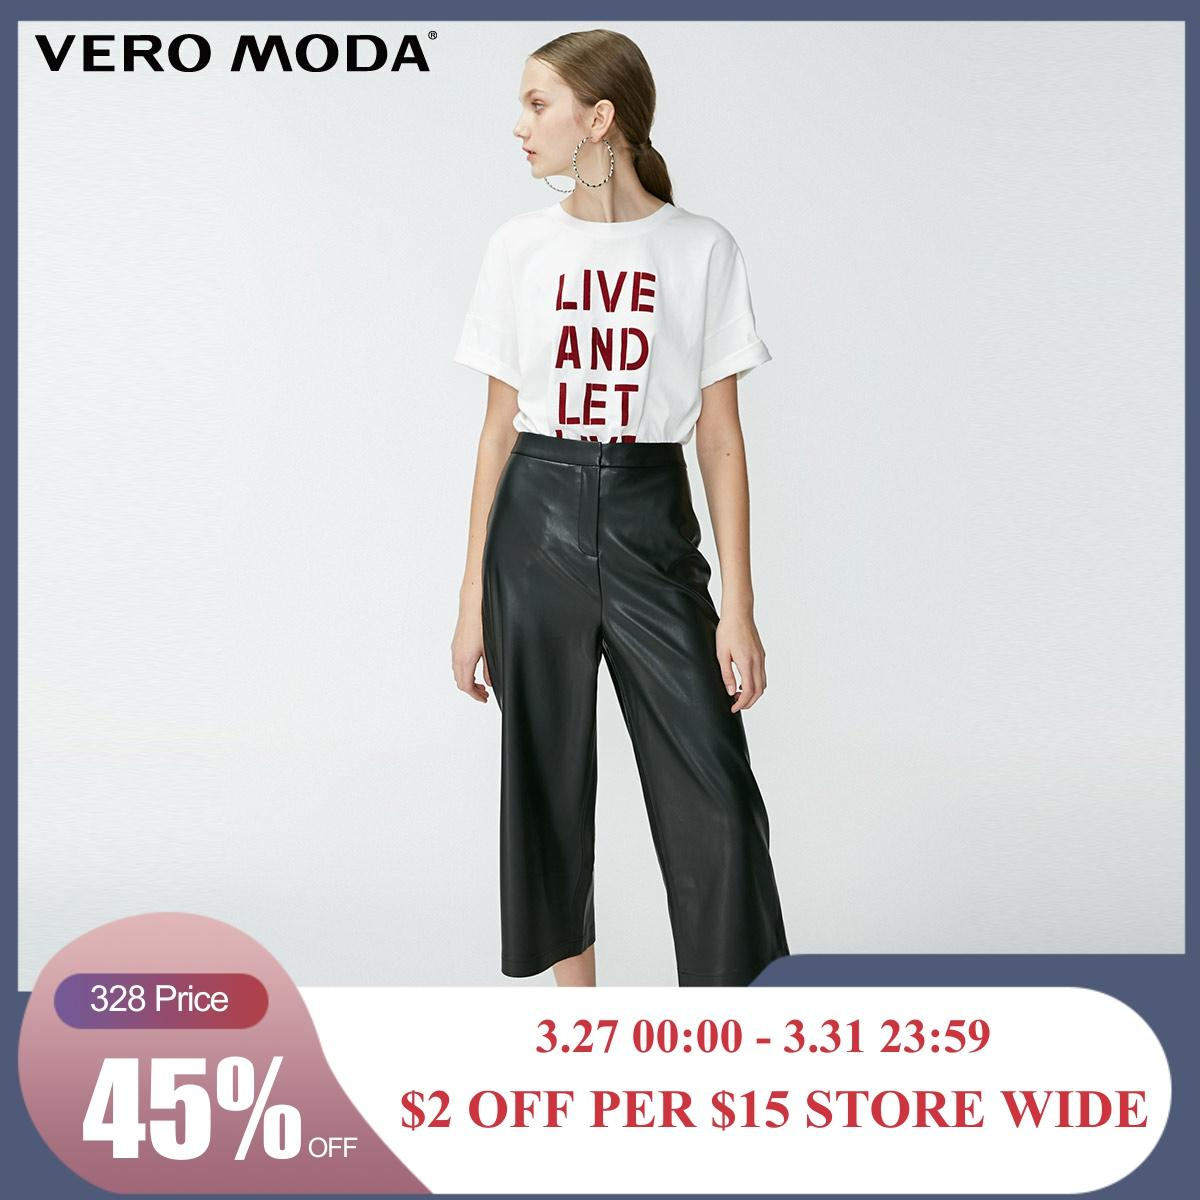 Vero Moda Women's Mid-rise Synthetic Leather Wide-leg Capri Pants | 31916J521